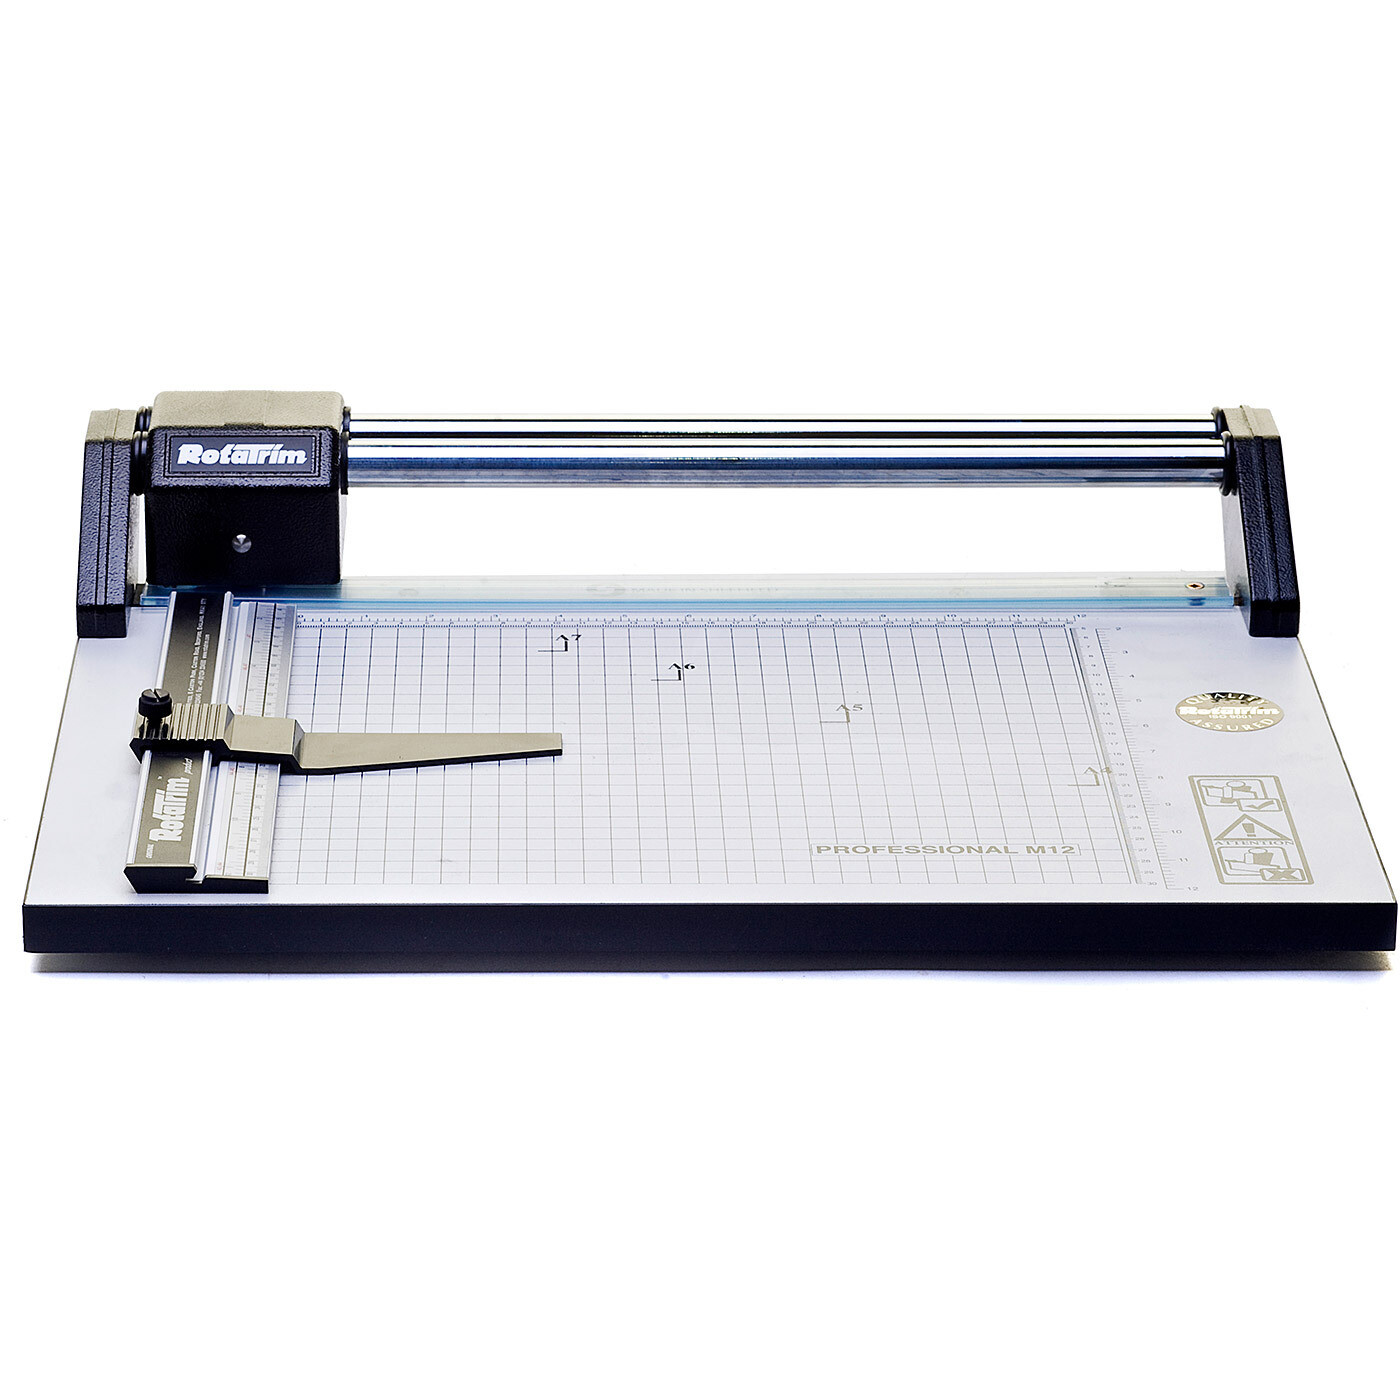 Rotatrim M20 Pro Series 20 Paper Cutter / Rotary Trimmer